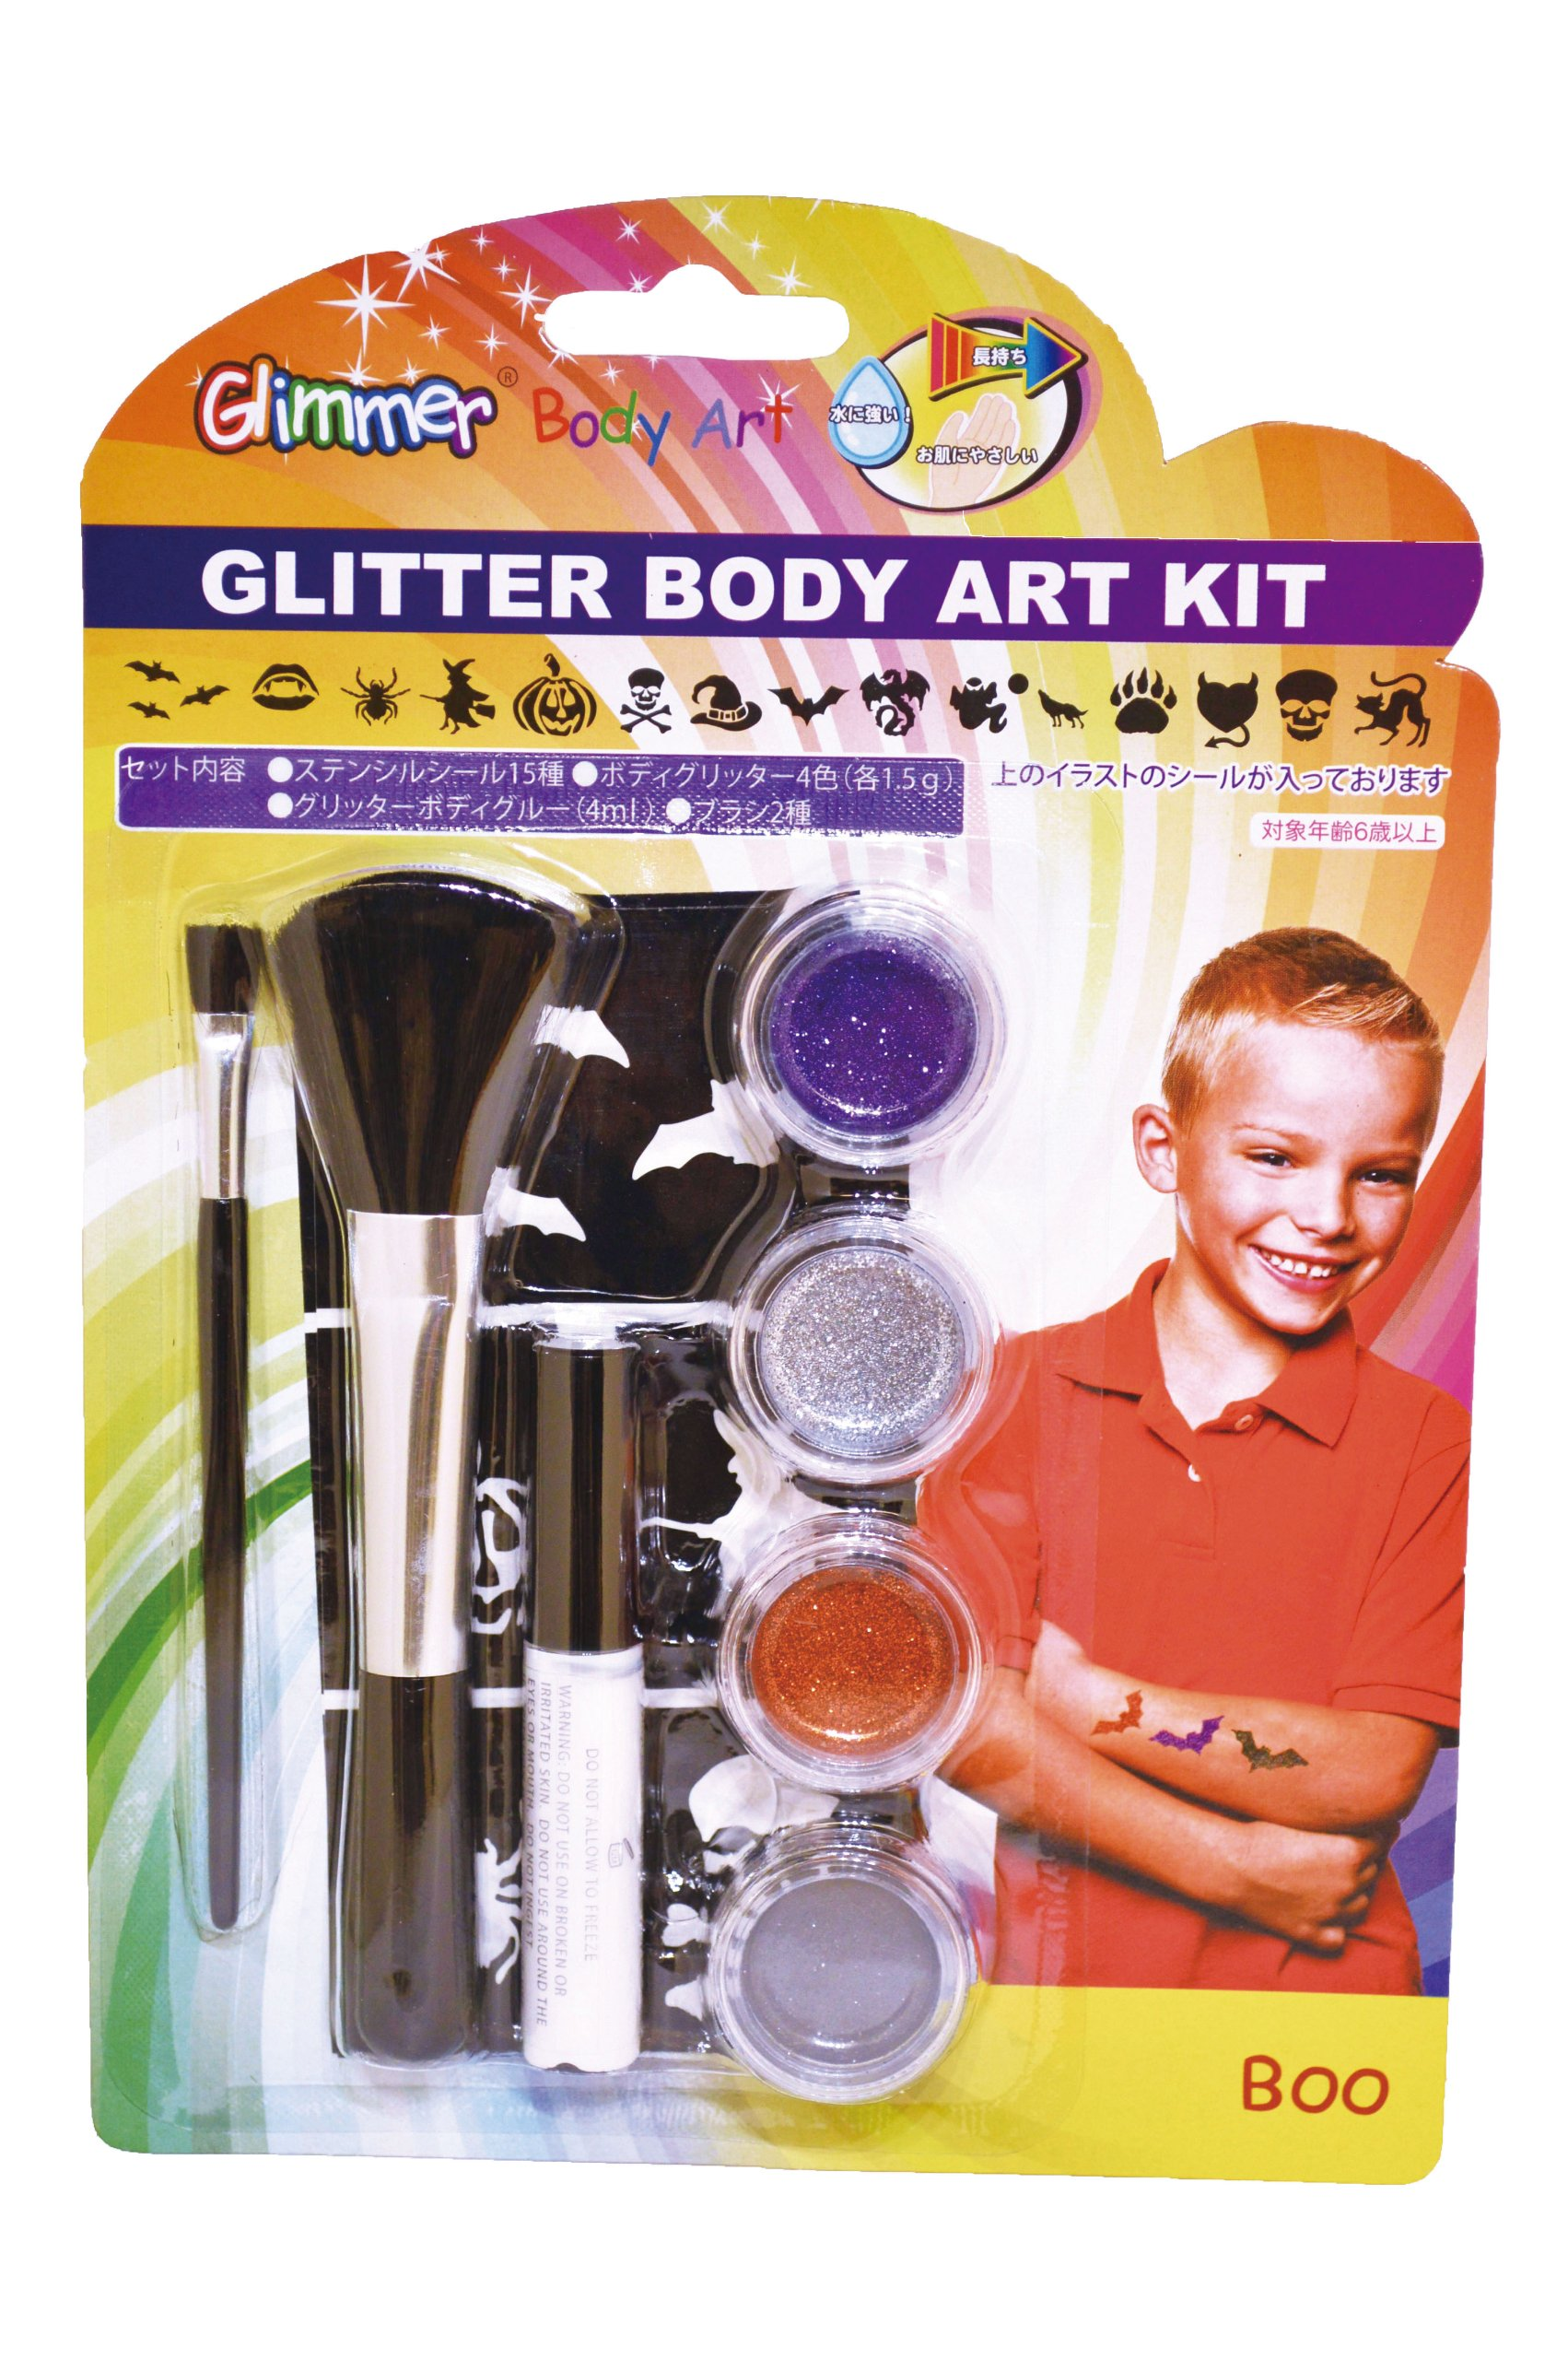 Glitter Tattoo Kits (Spooky) by Glimmer Body Art (Image #2)